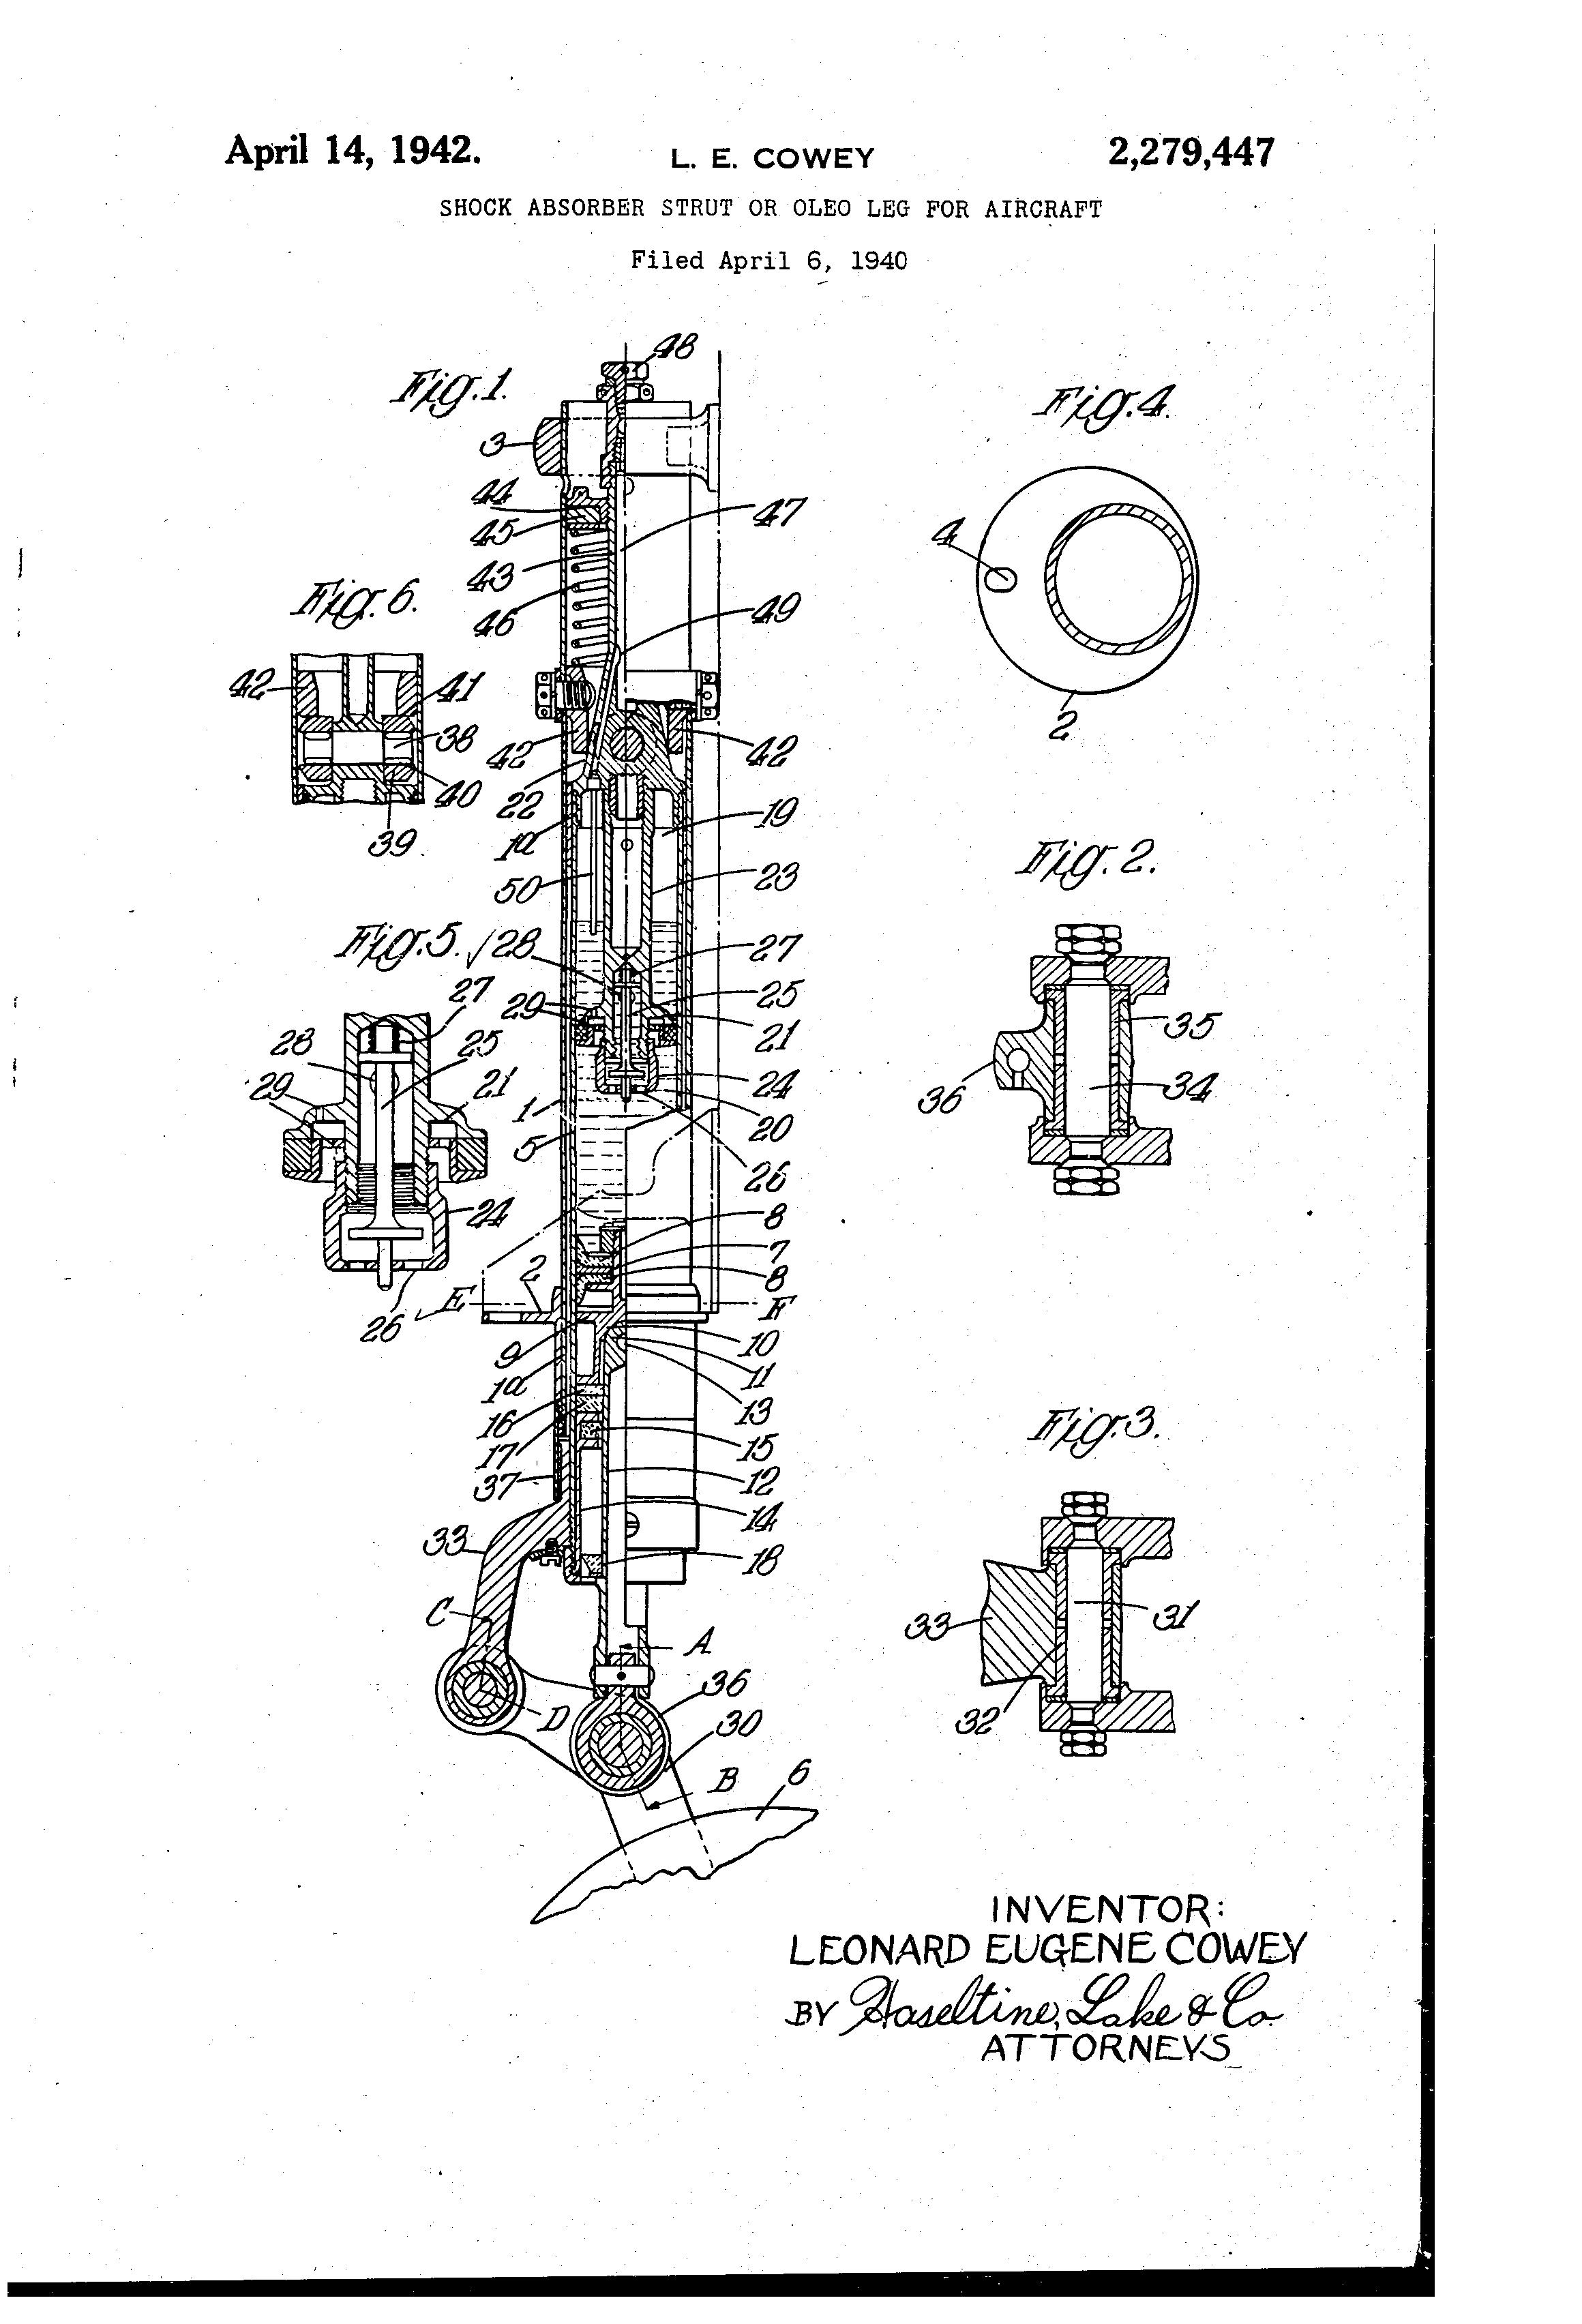 2004 chrysler strut diagram patent us2279447 - shock absorber strut or oleo leg for ...